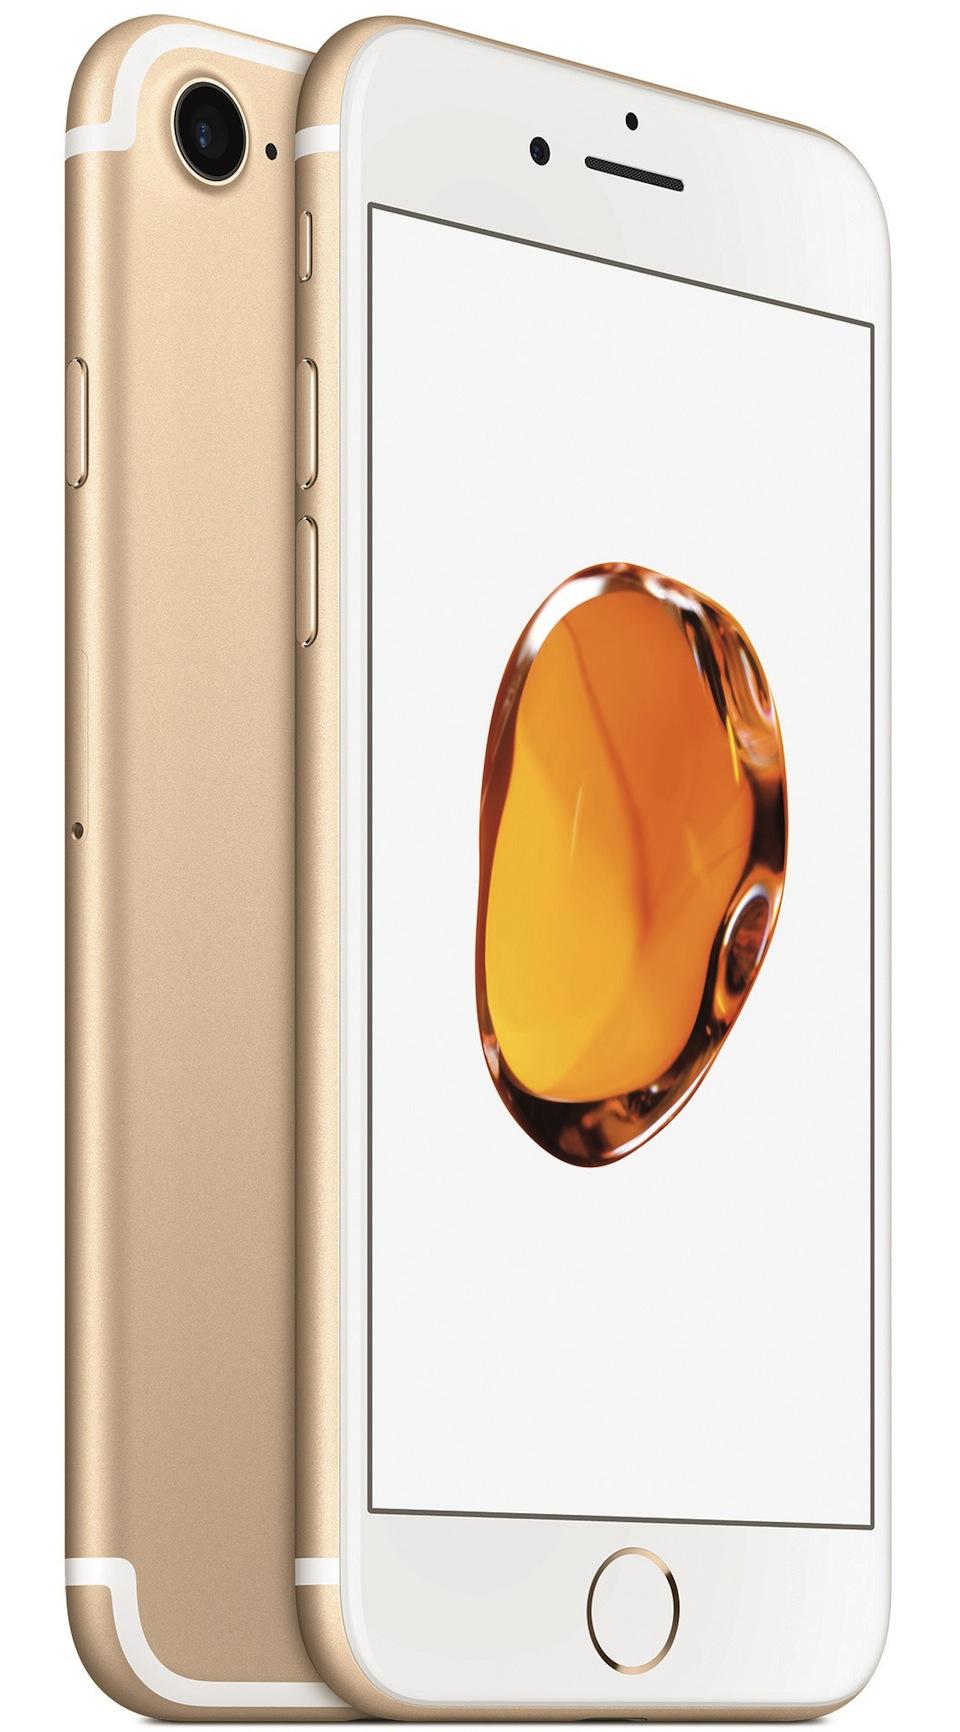 Cadou de Craciun iPhone 7 Auriu 32GB